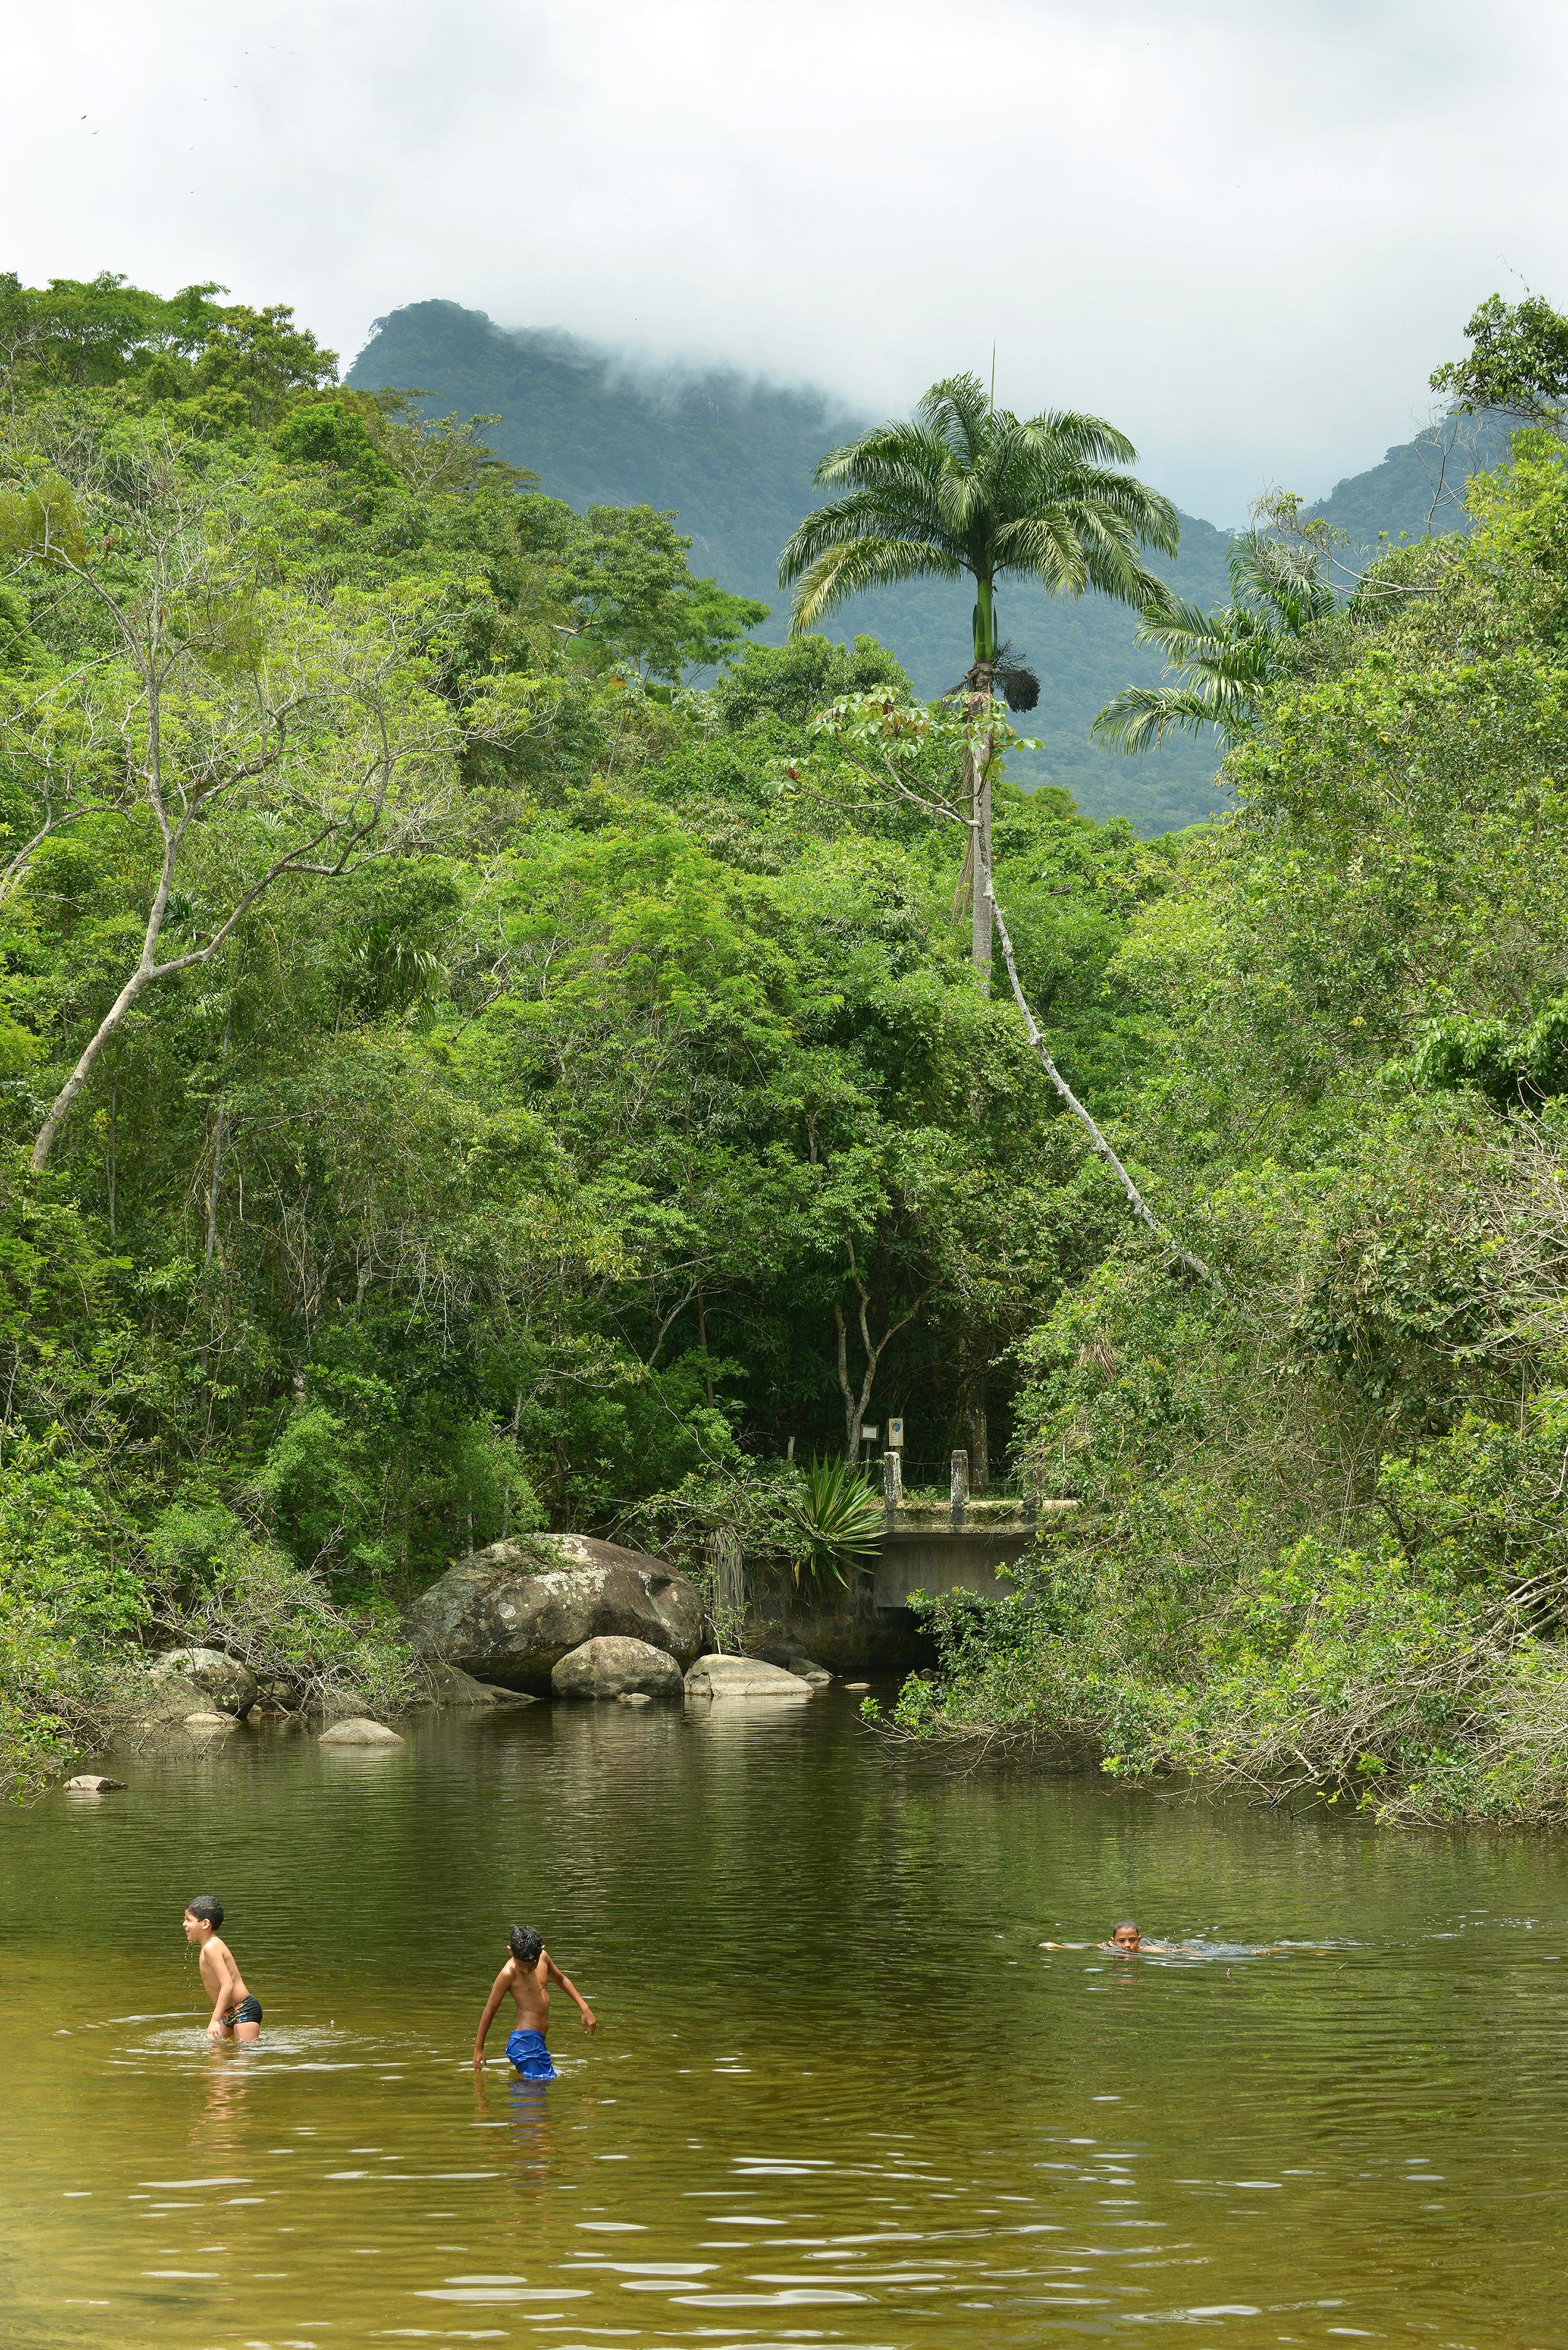 Brasilia Ilha Grande joki ja lapset